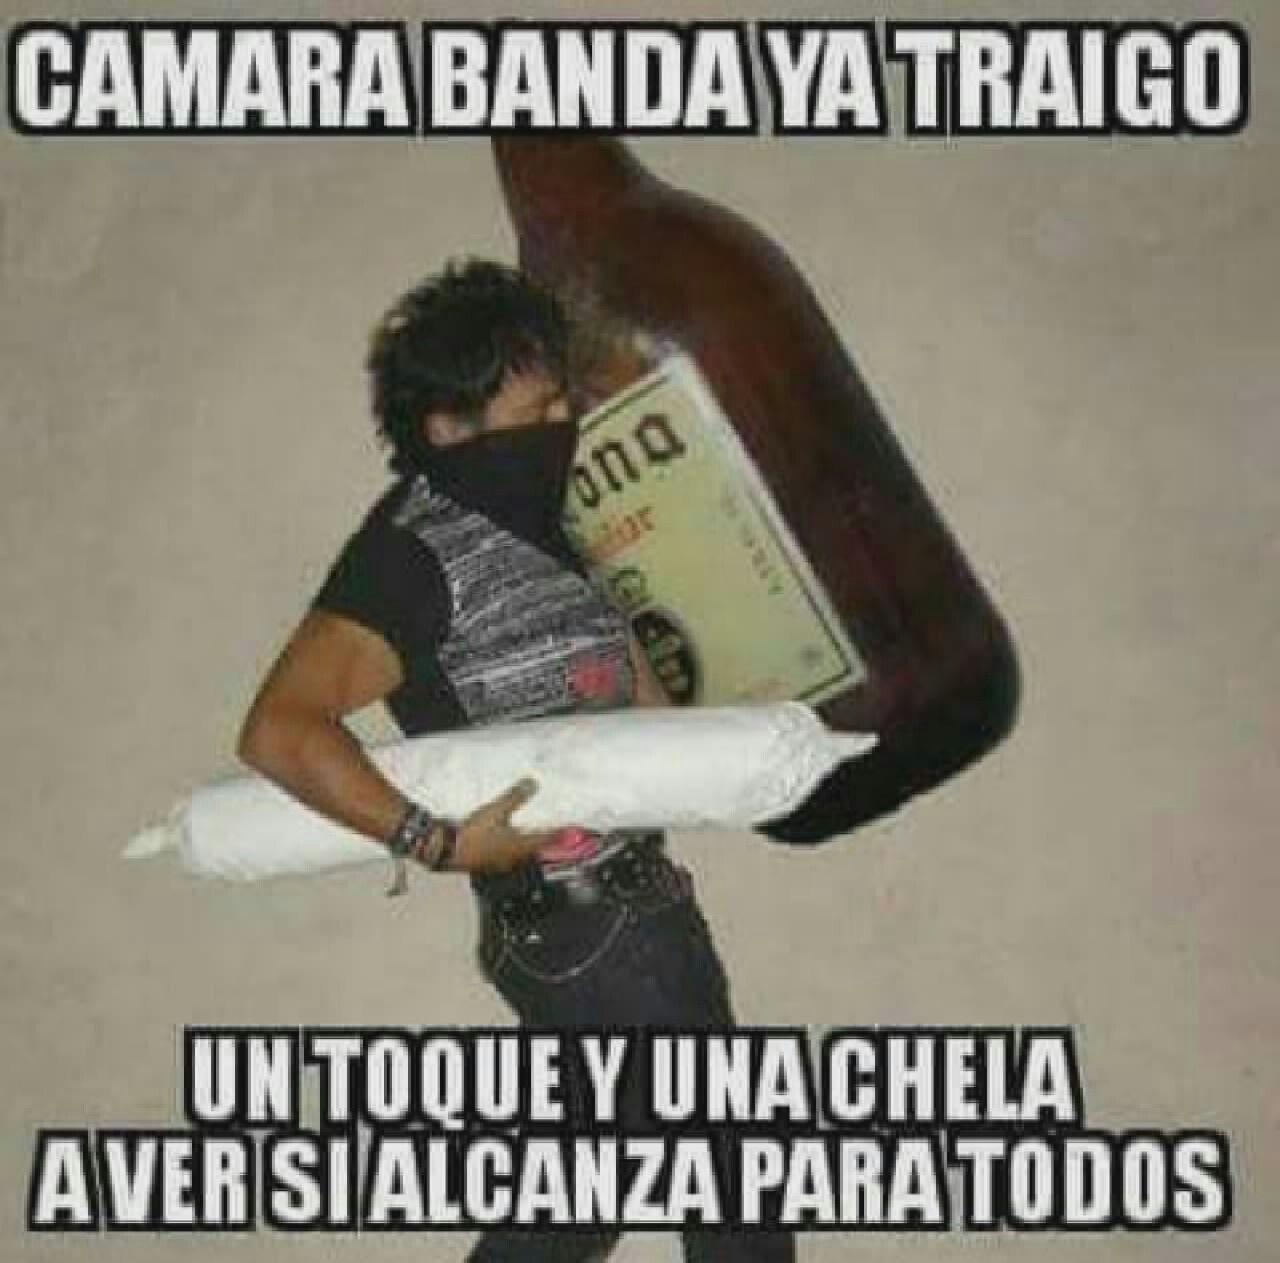 Pin By Paola Lara On Memes Y Chistes Humor Funny Memes Funny Spanish Memes